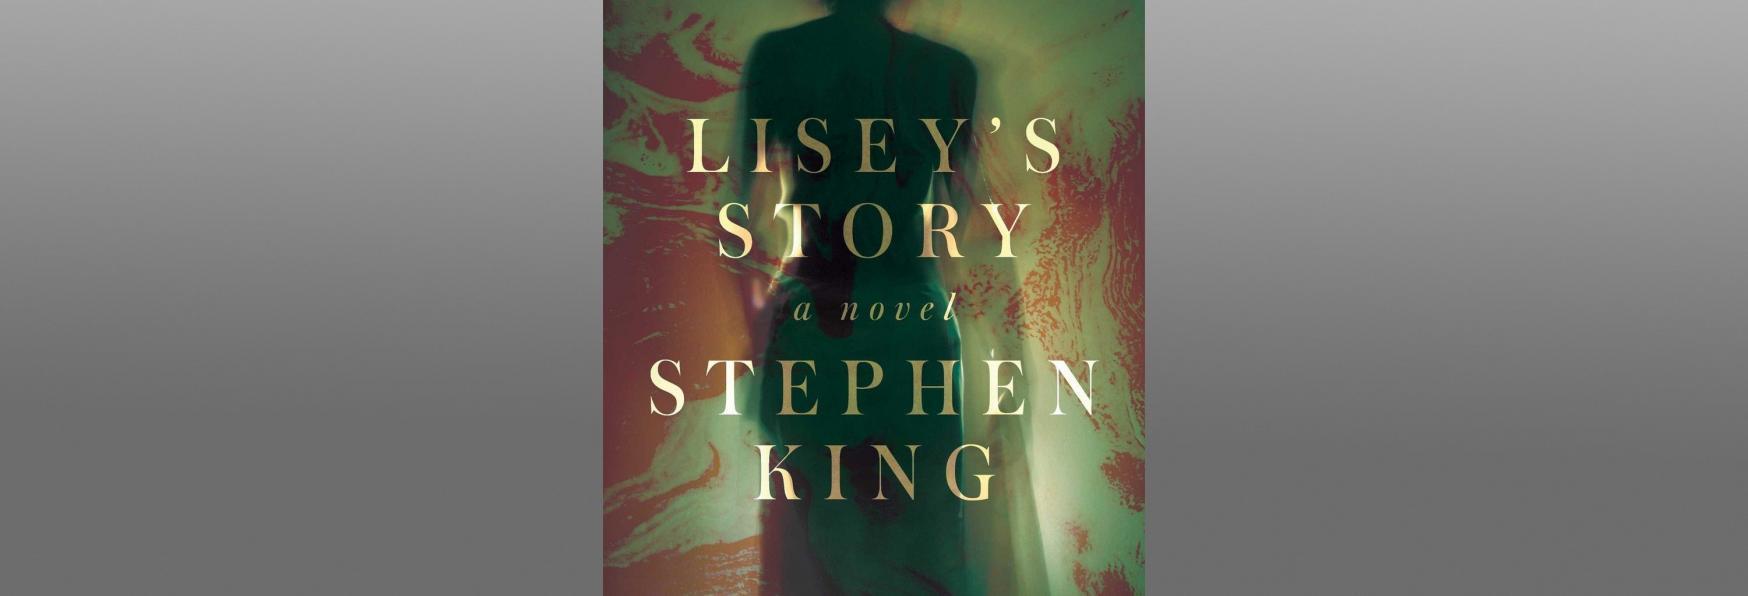 Lisey's Story: Aggiornamenti sulla Serie TV targata Apple e basata sull'Opera di Stephen King